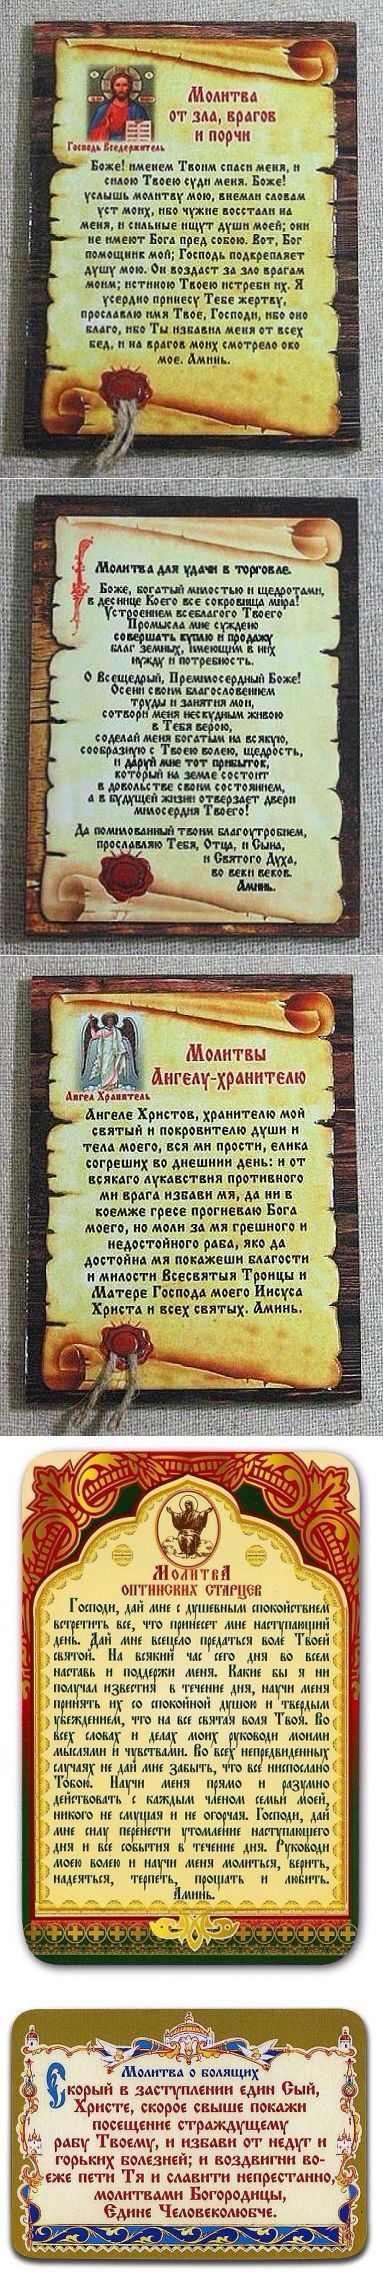 (61) Одноклассники | гороскоп | Постила